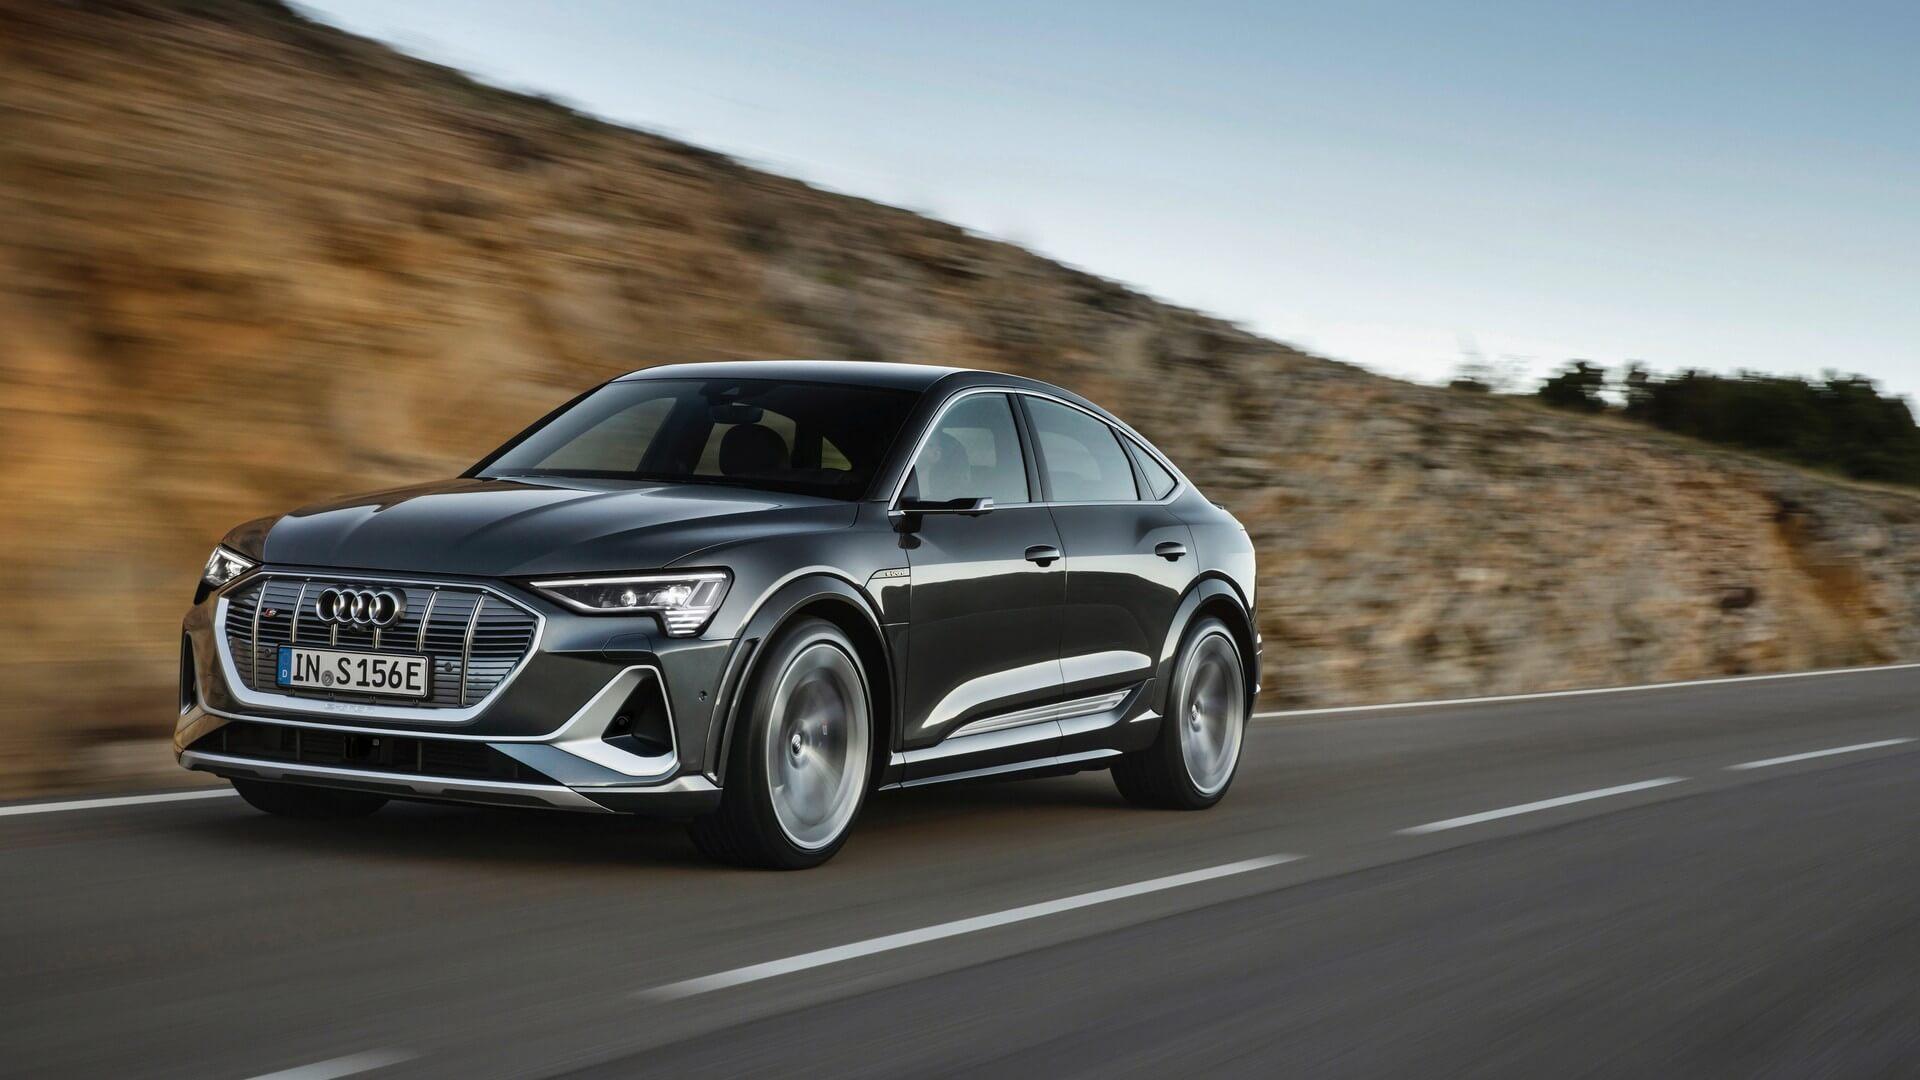 Audi-E-Tron-S-and-E-Tron-S-Sportback-2020-49